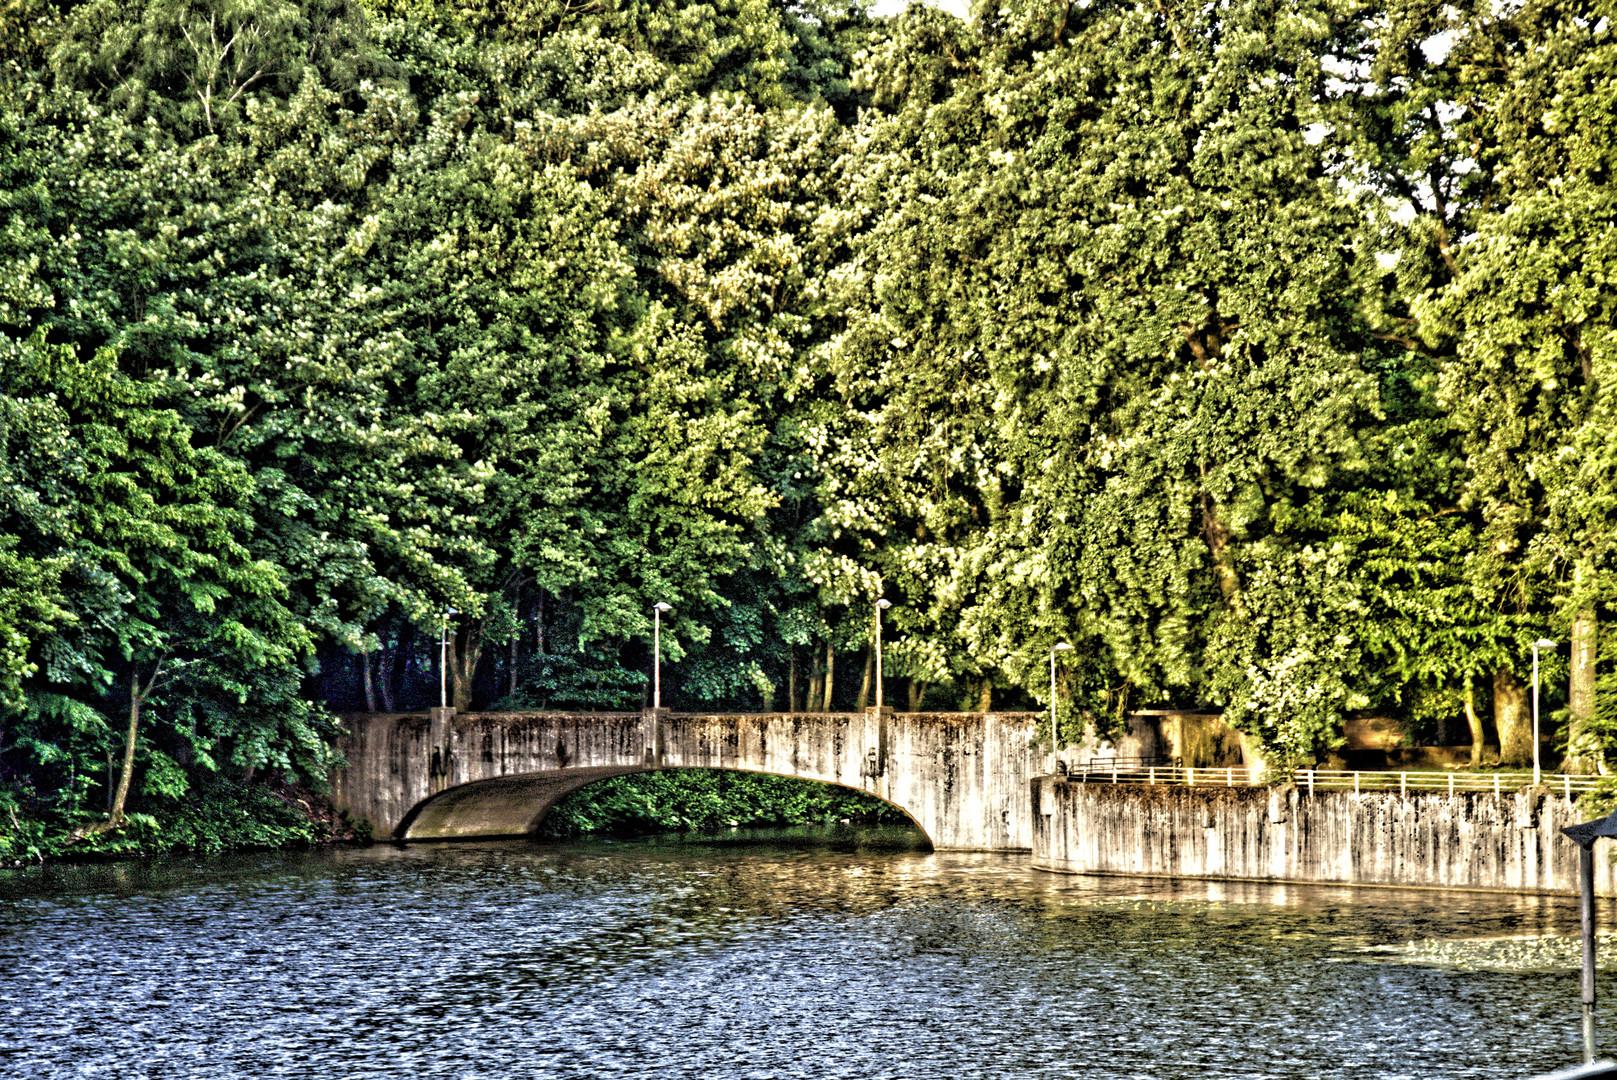 Brücke mit Grün